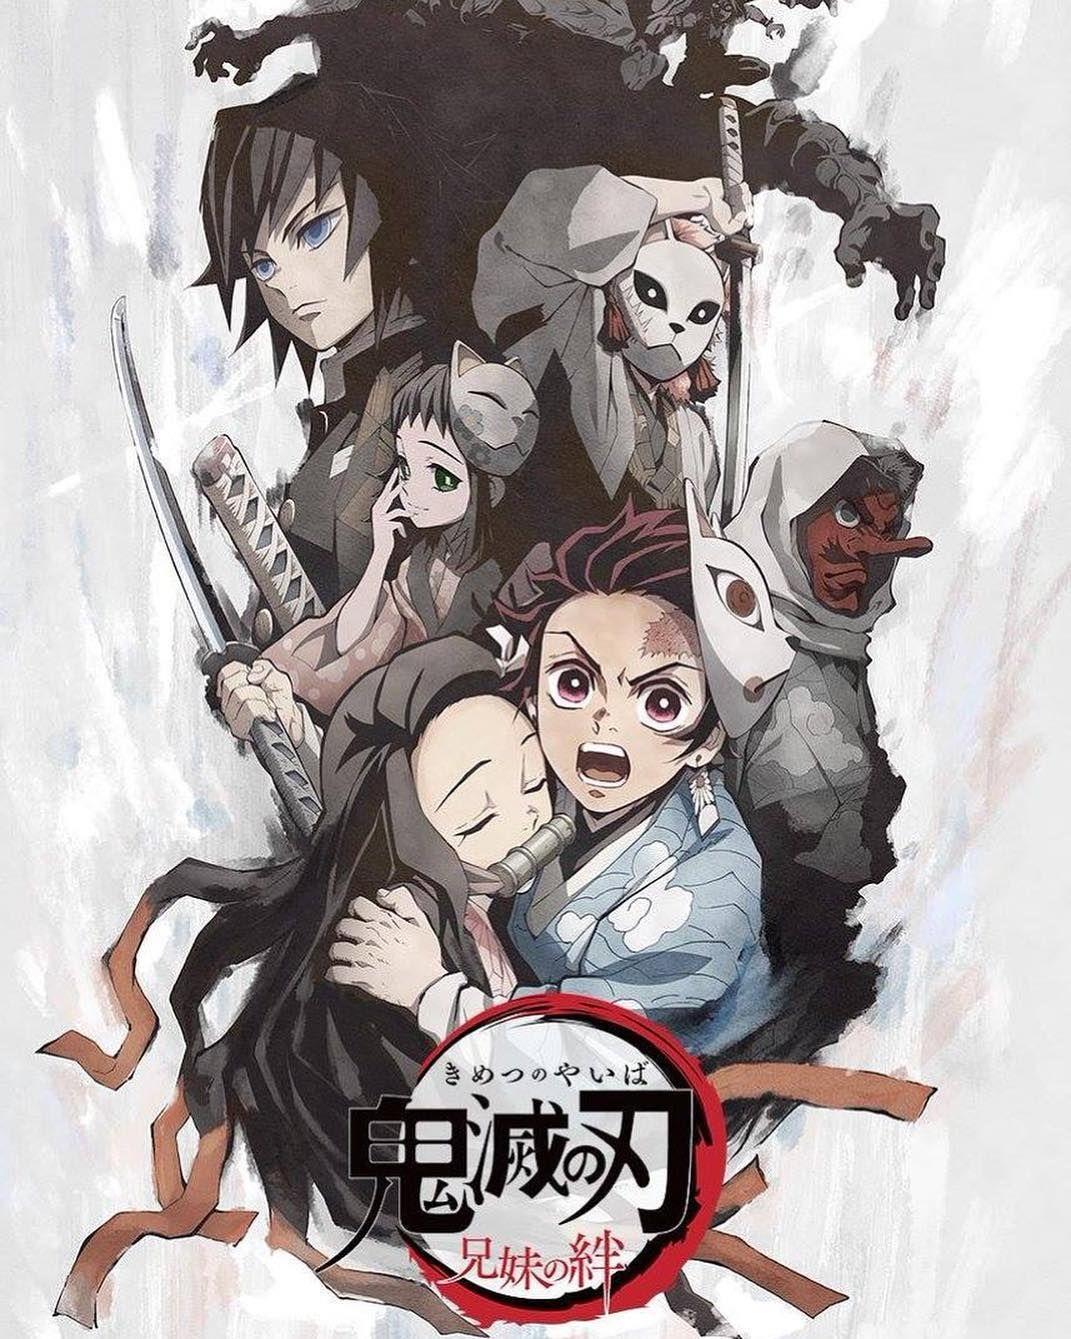 Demon slayer kimetsu no yaiba anime demon slayer anime